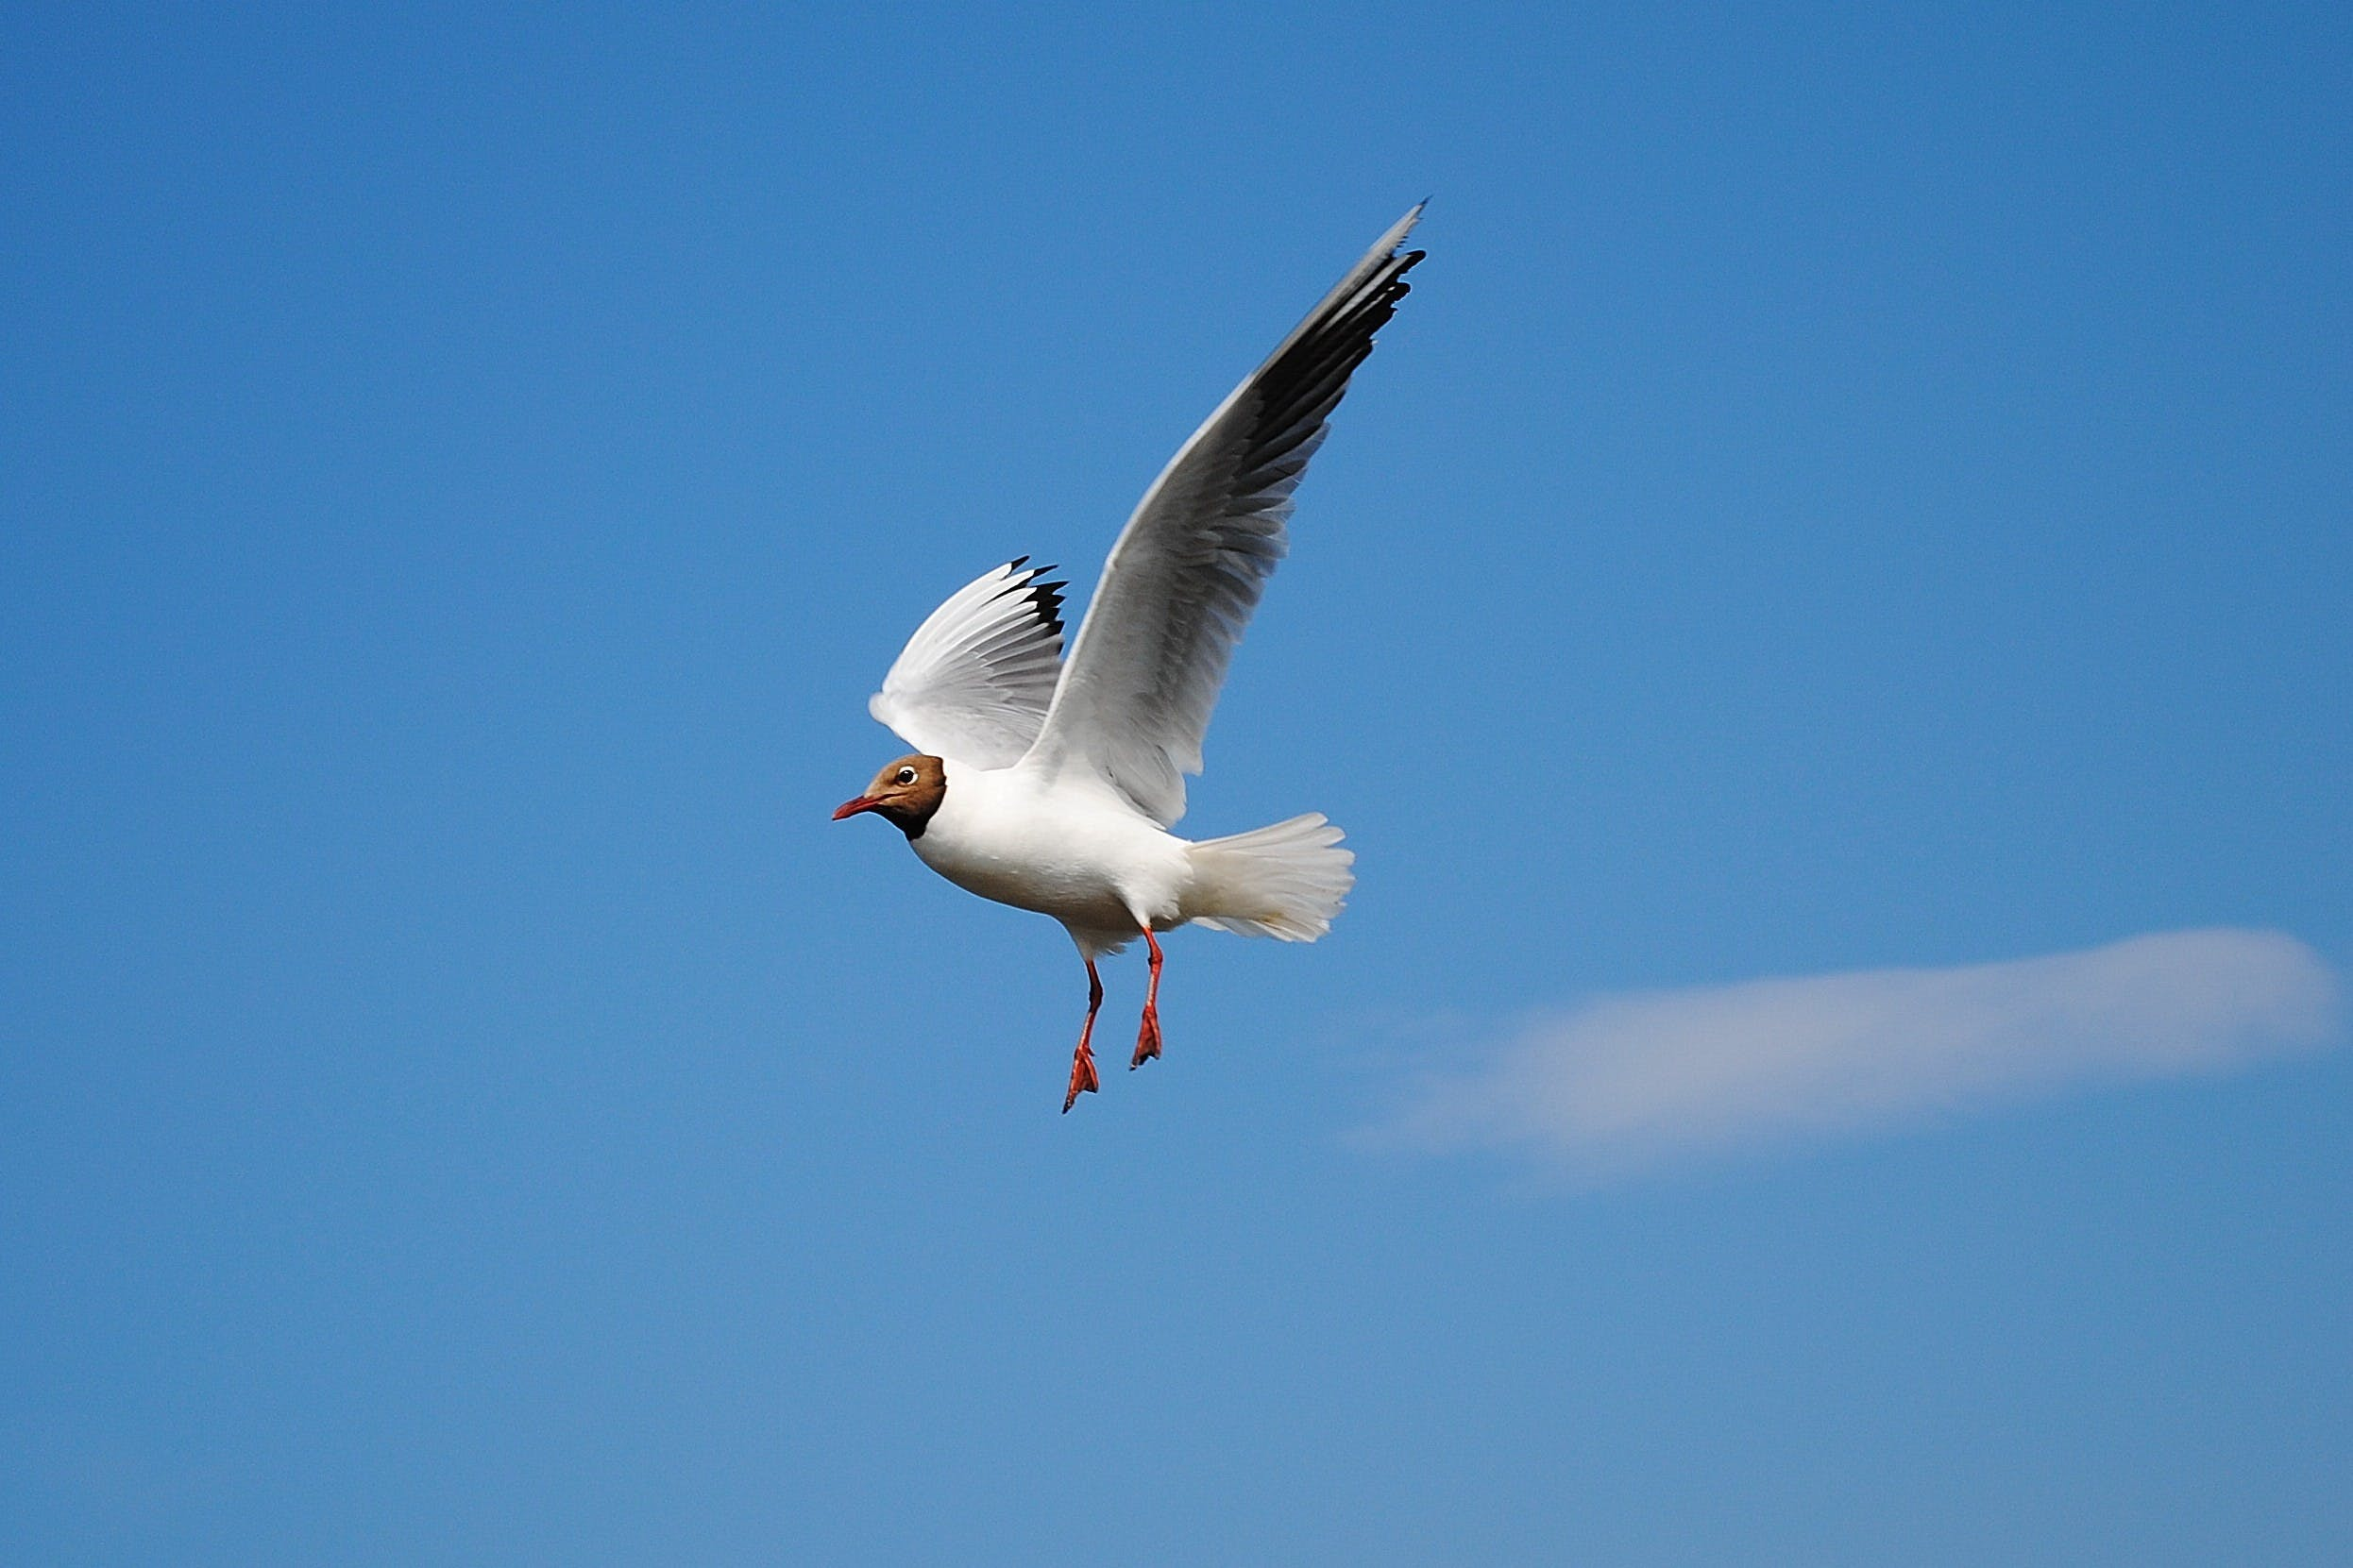 White Bird Flying Above Blue Skies during Daytime